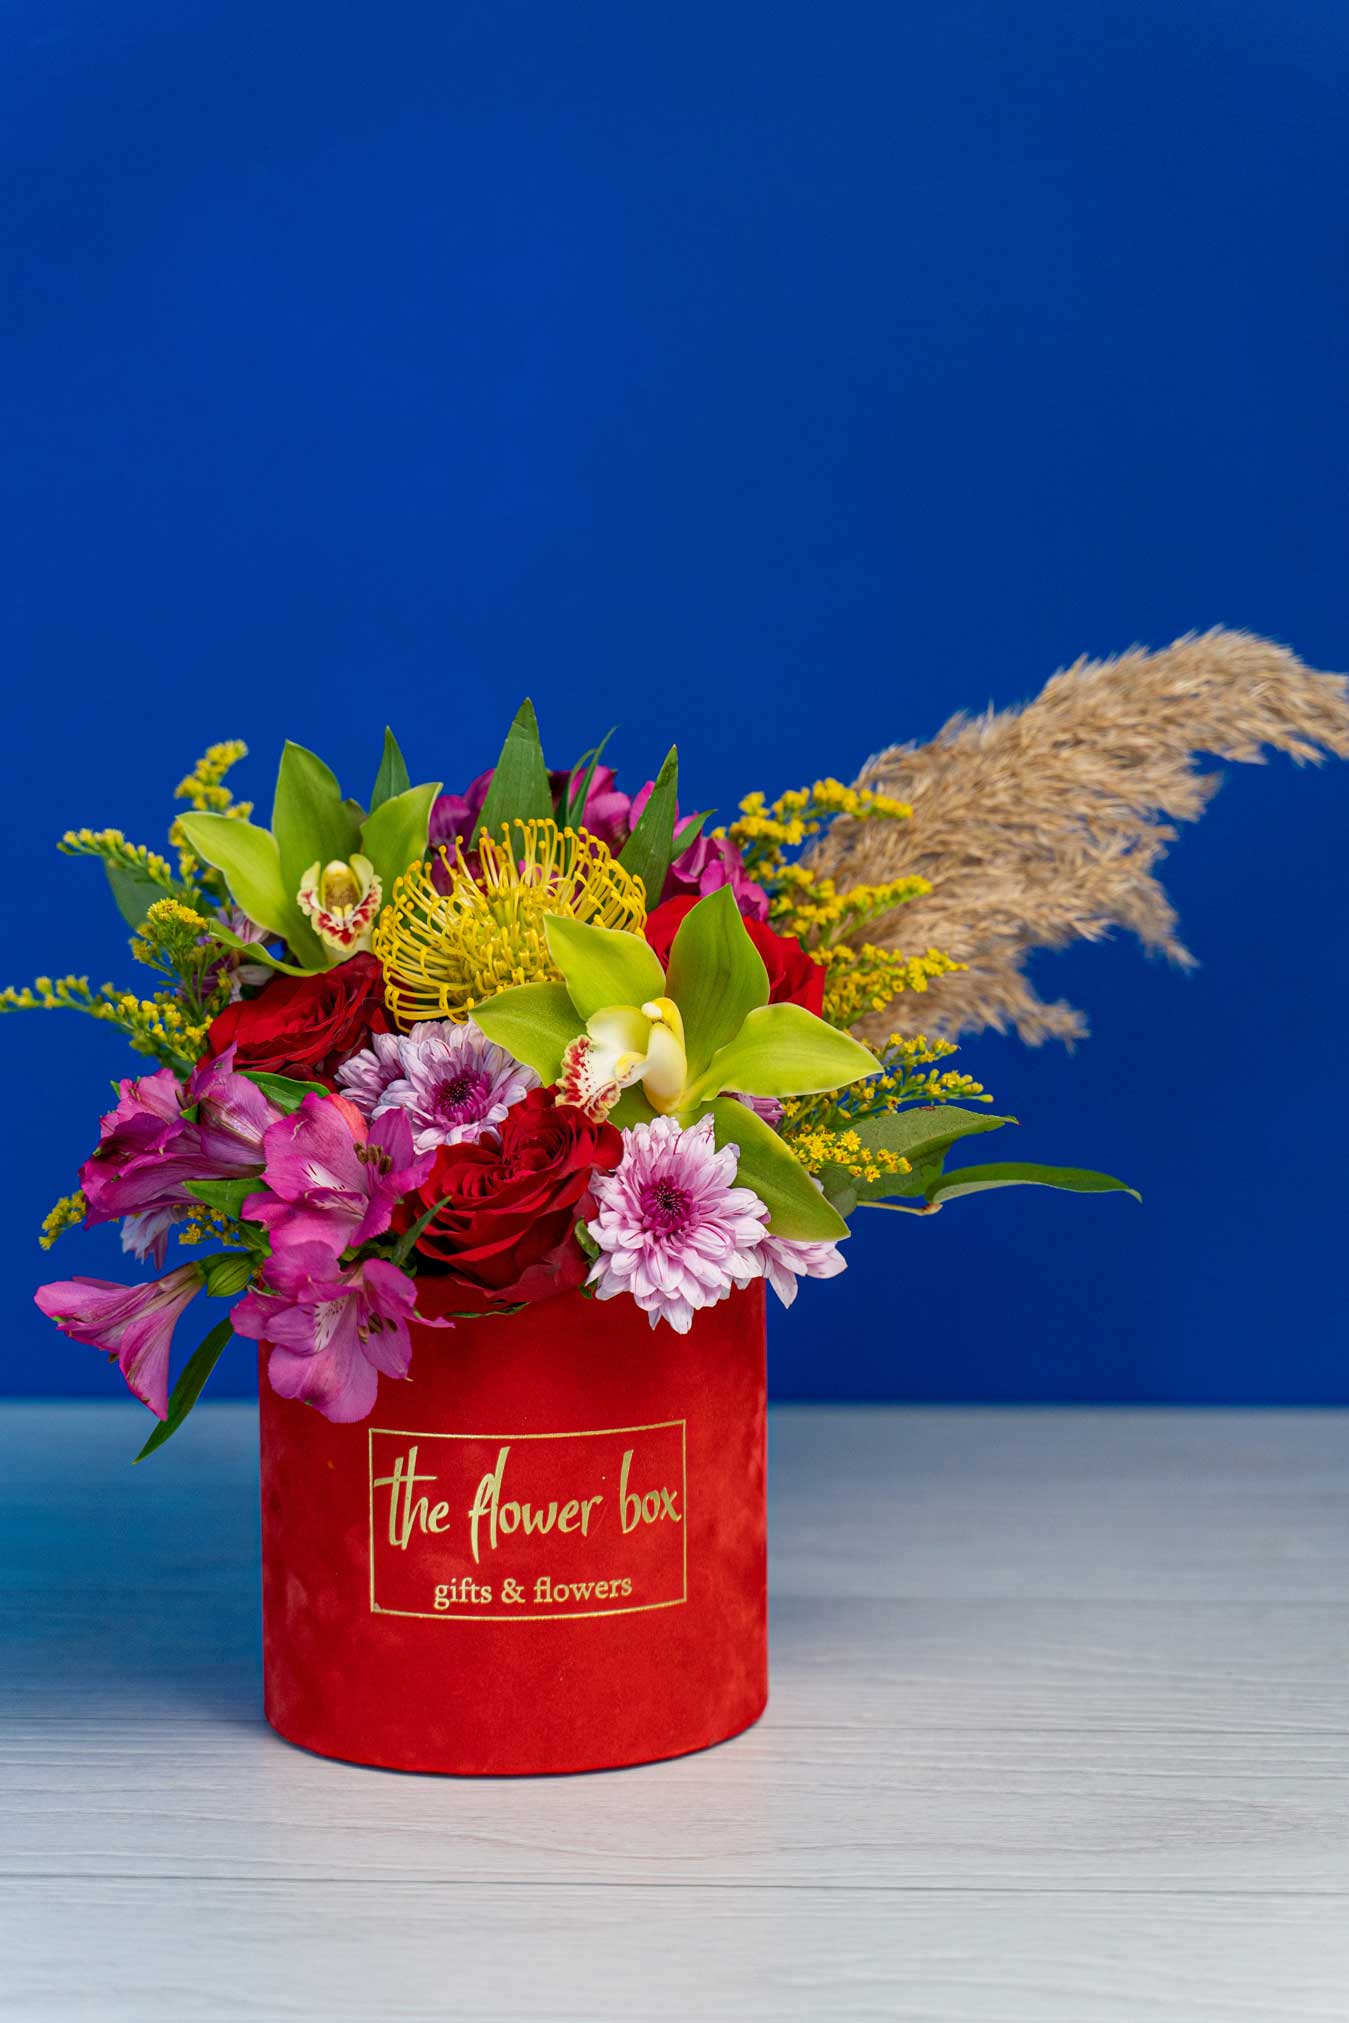 Aranjament floral Red Box